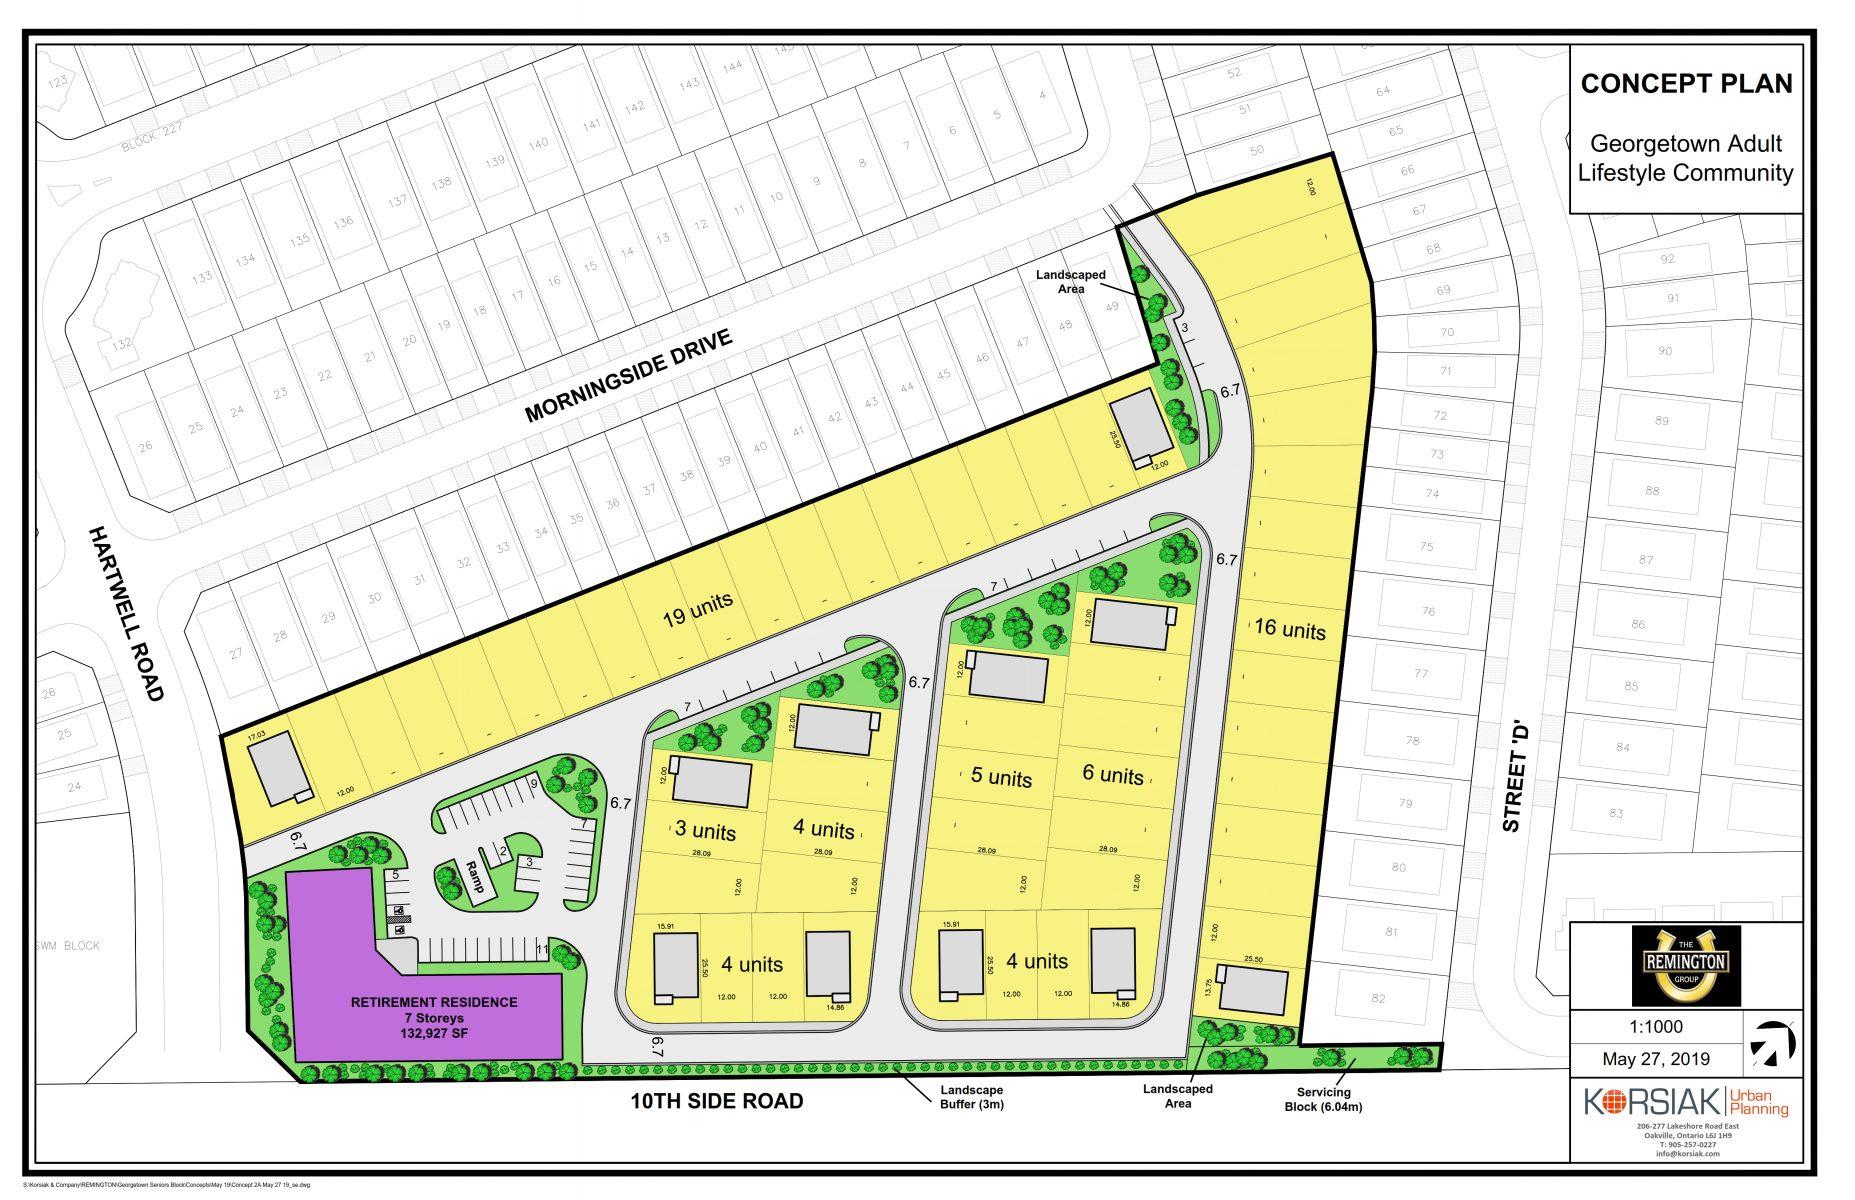 Korsiak Urban Planning - Halton Hills Portfolio - Georgetown Seniors, Greenfield Development - Halton Hills, Ontario